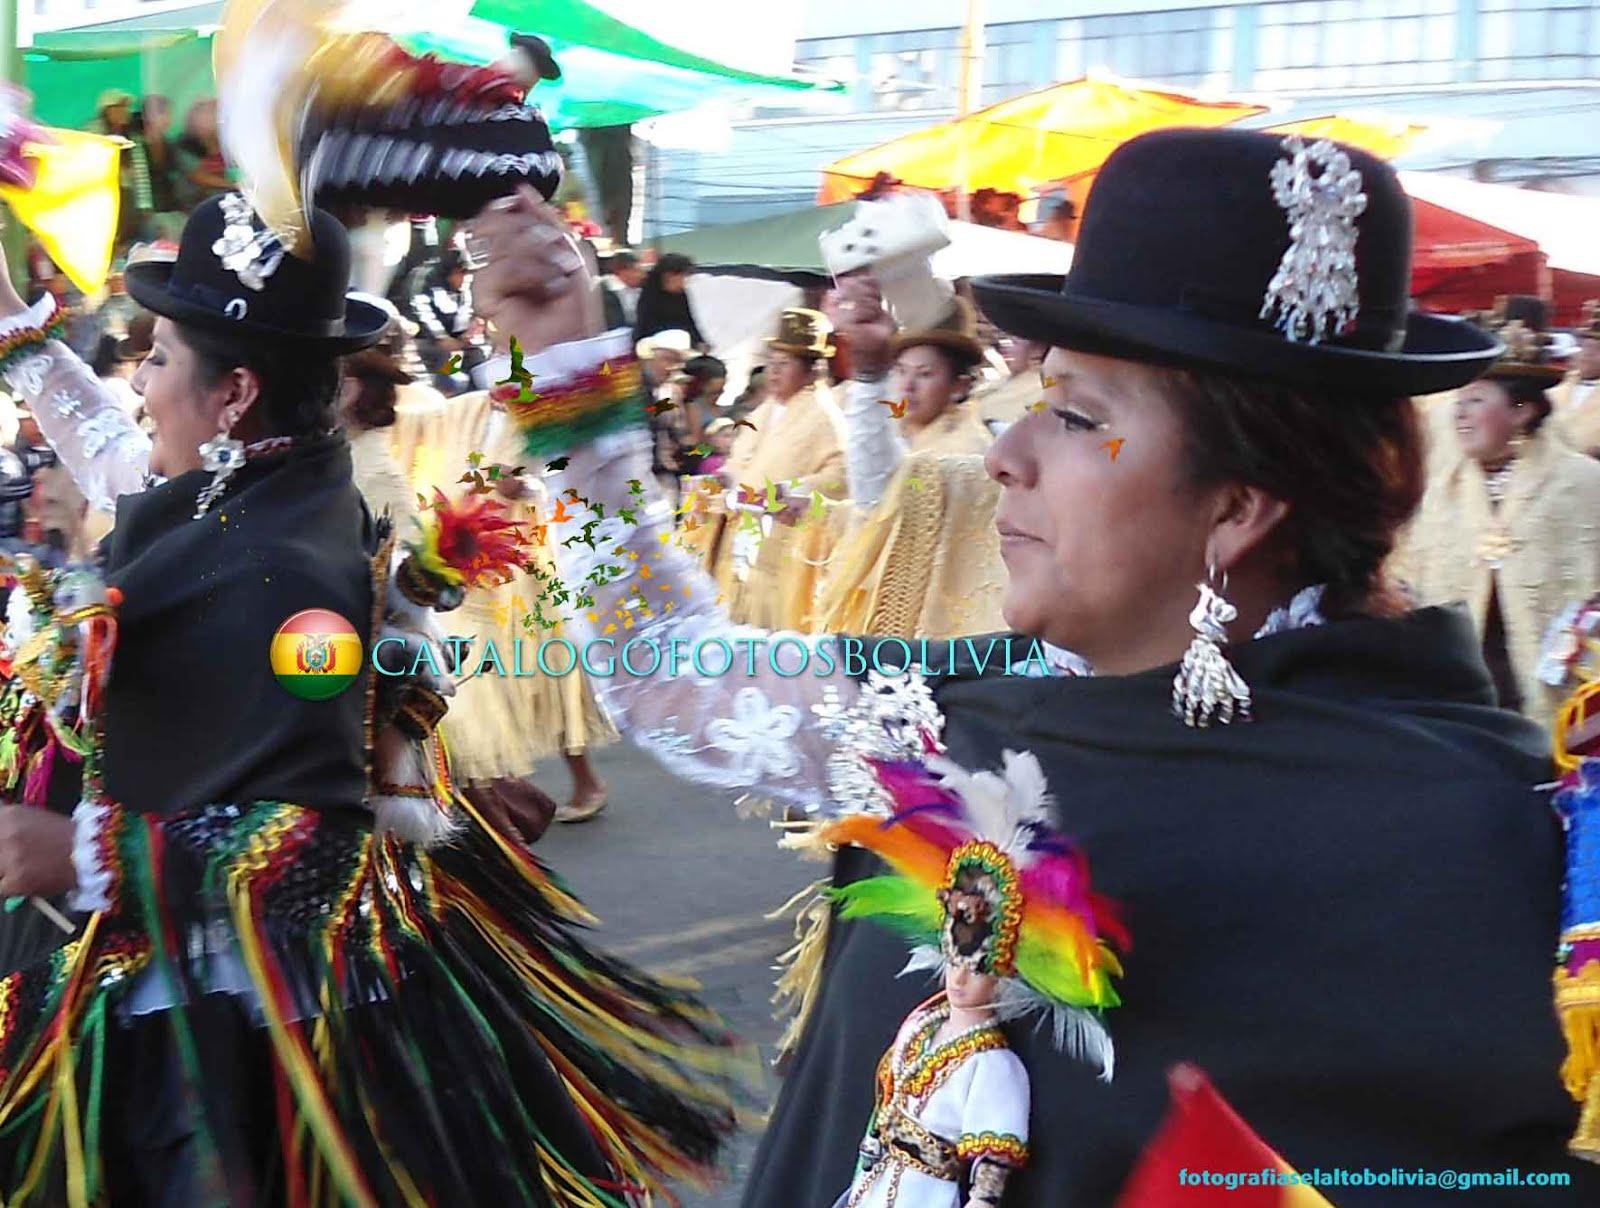 Moda cholita: Últimas tendencias 2012